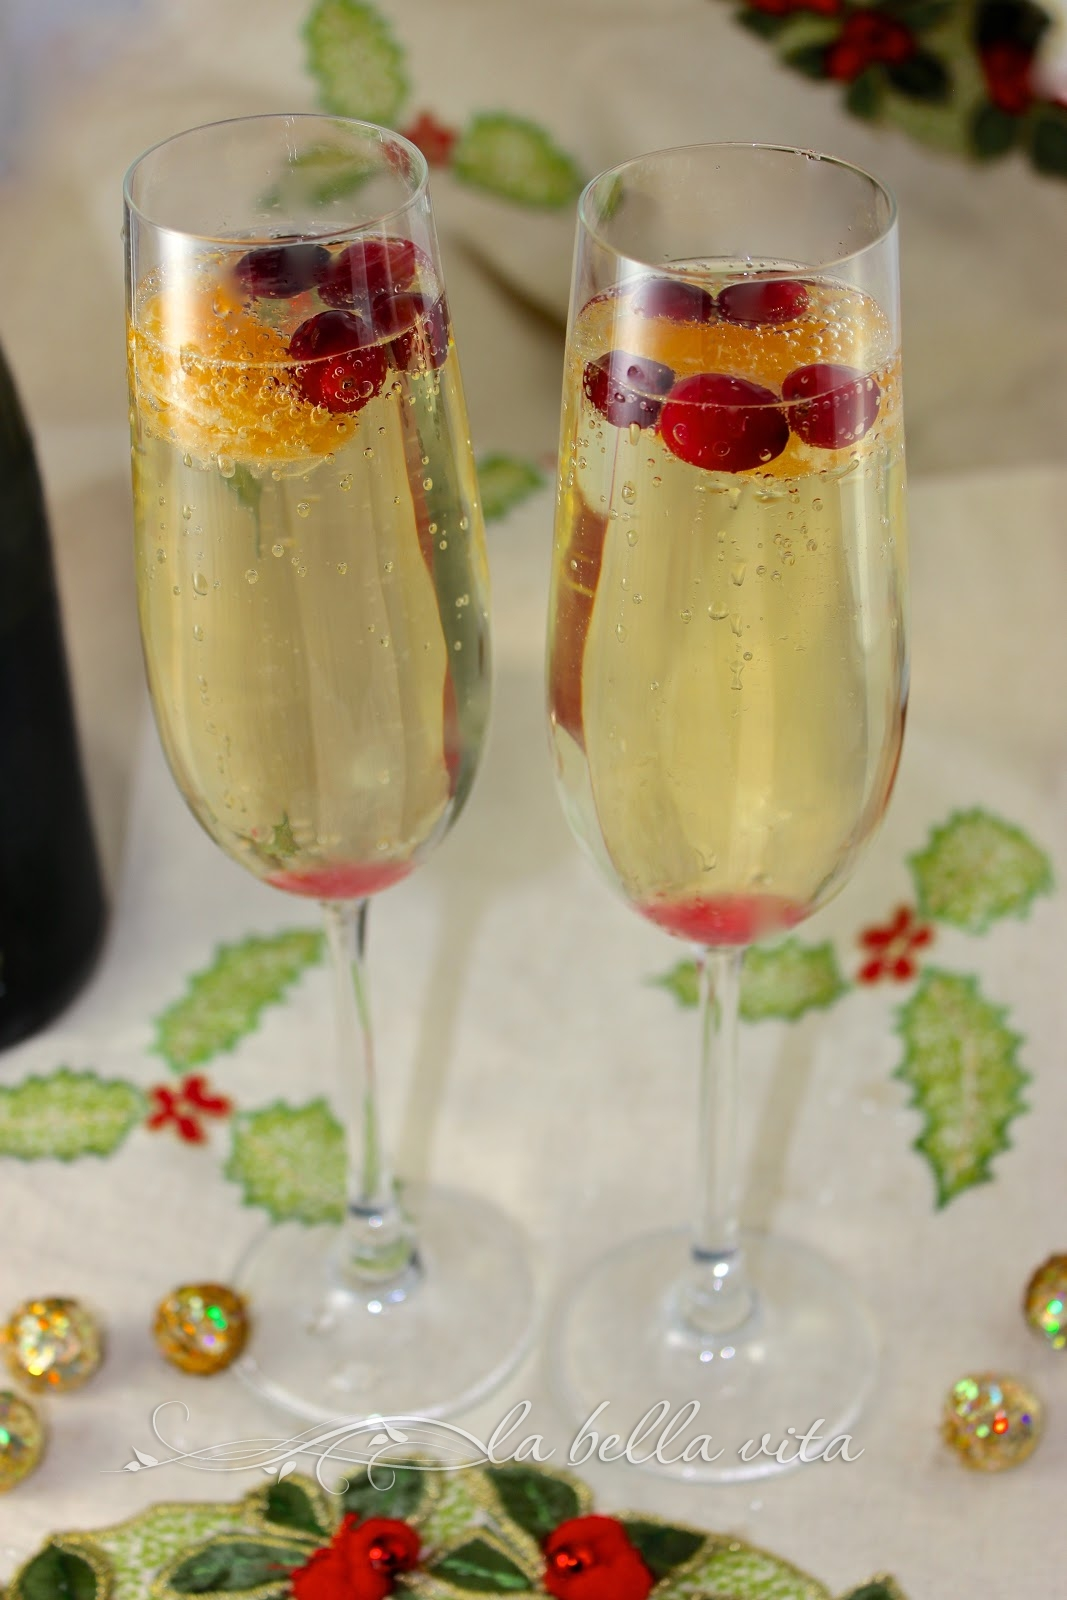 cranberry clementine and prosecco cocktails la bella vita cucina. Black Bedroom Furniture Sets. Home Design Ideas